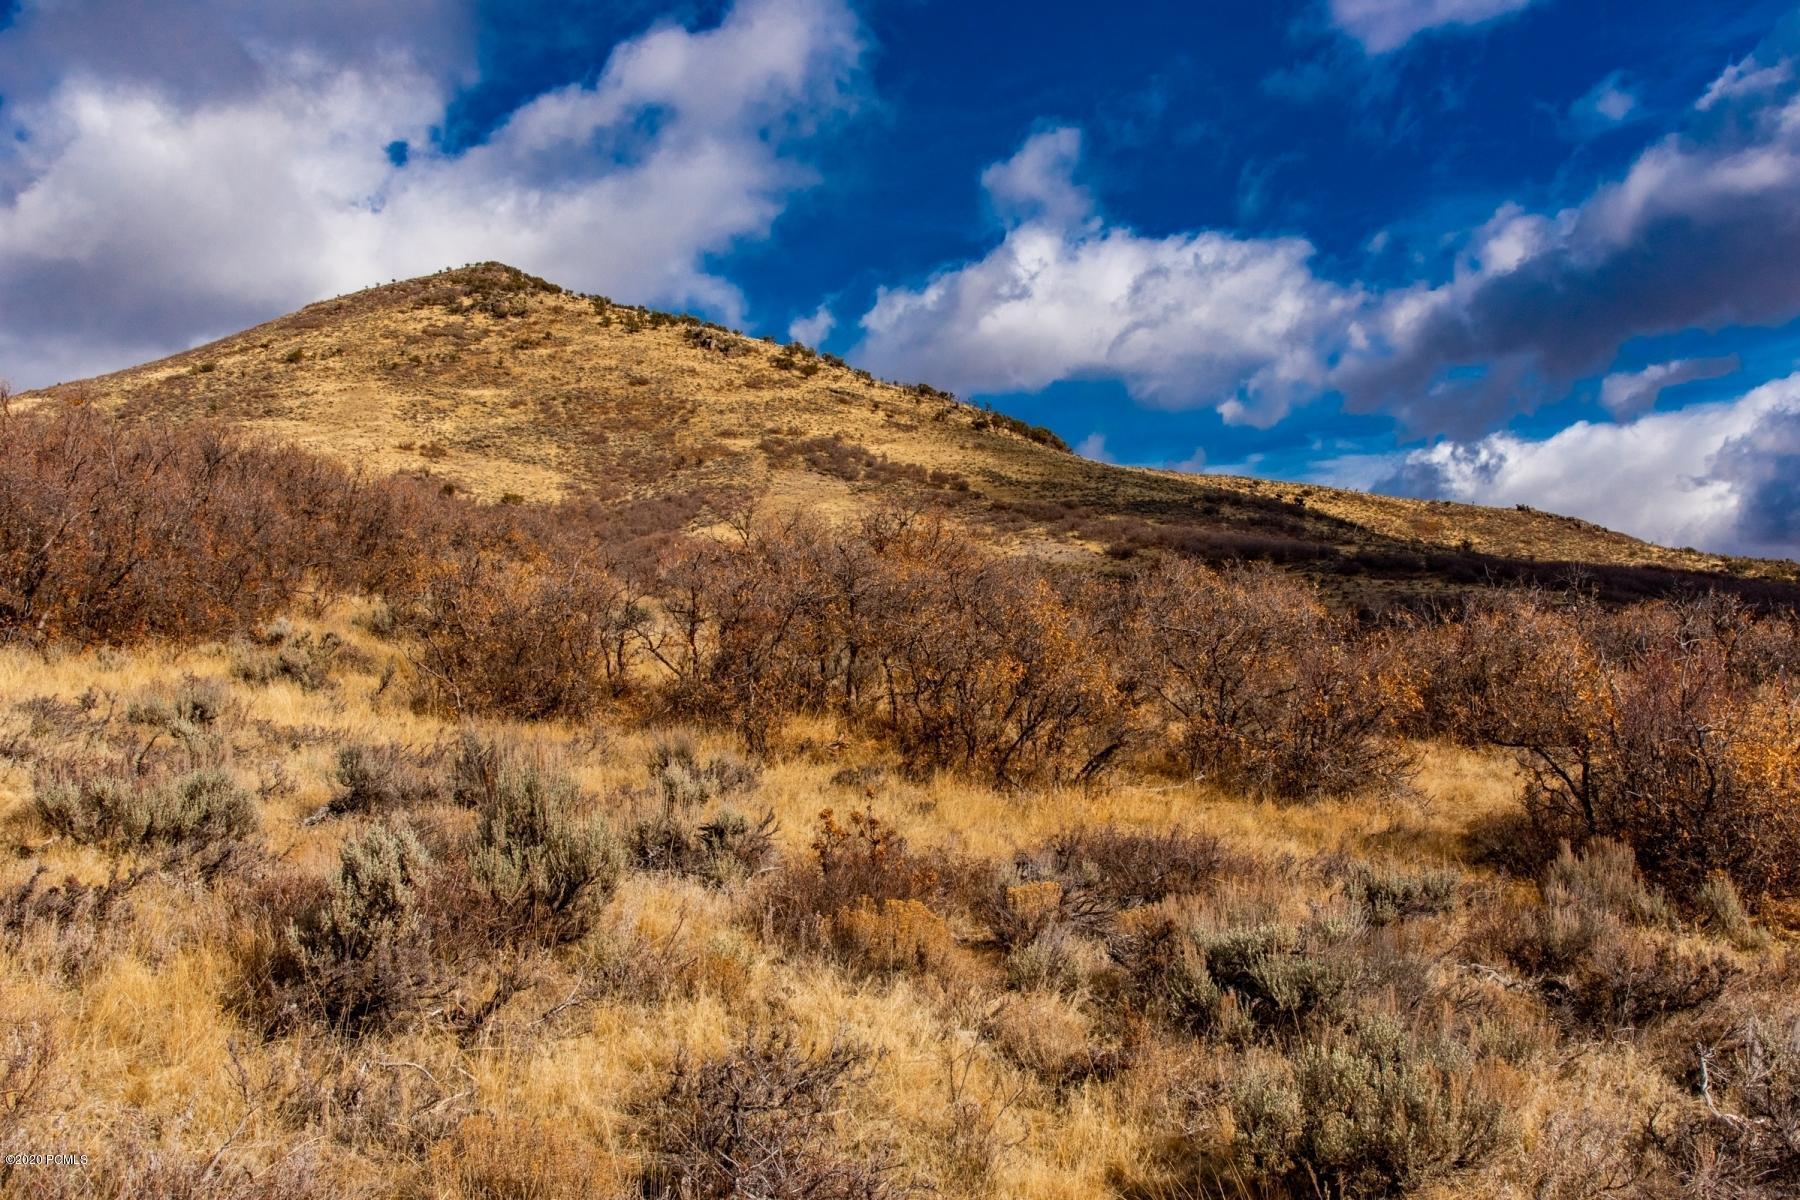 1402 Skyridge Drive, Heber City, Utah 84032, ,Land,For Sale,Skyridge,20190109112430415765000000